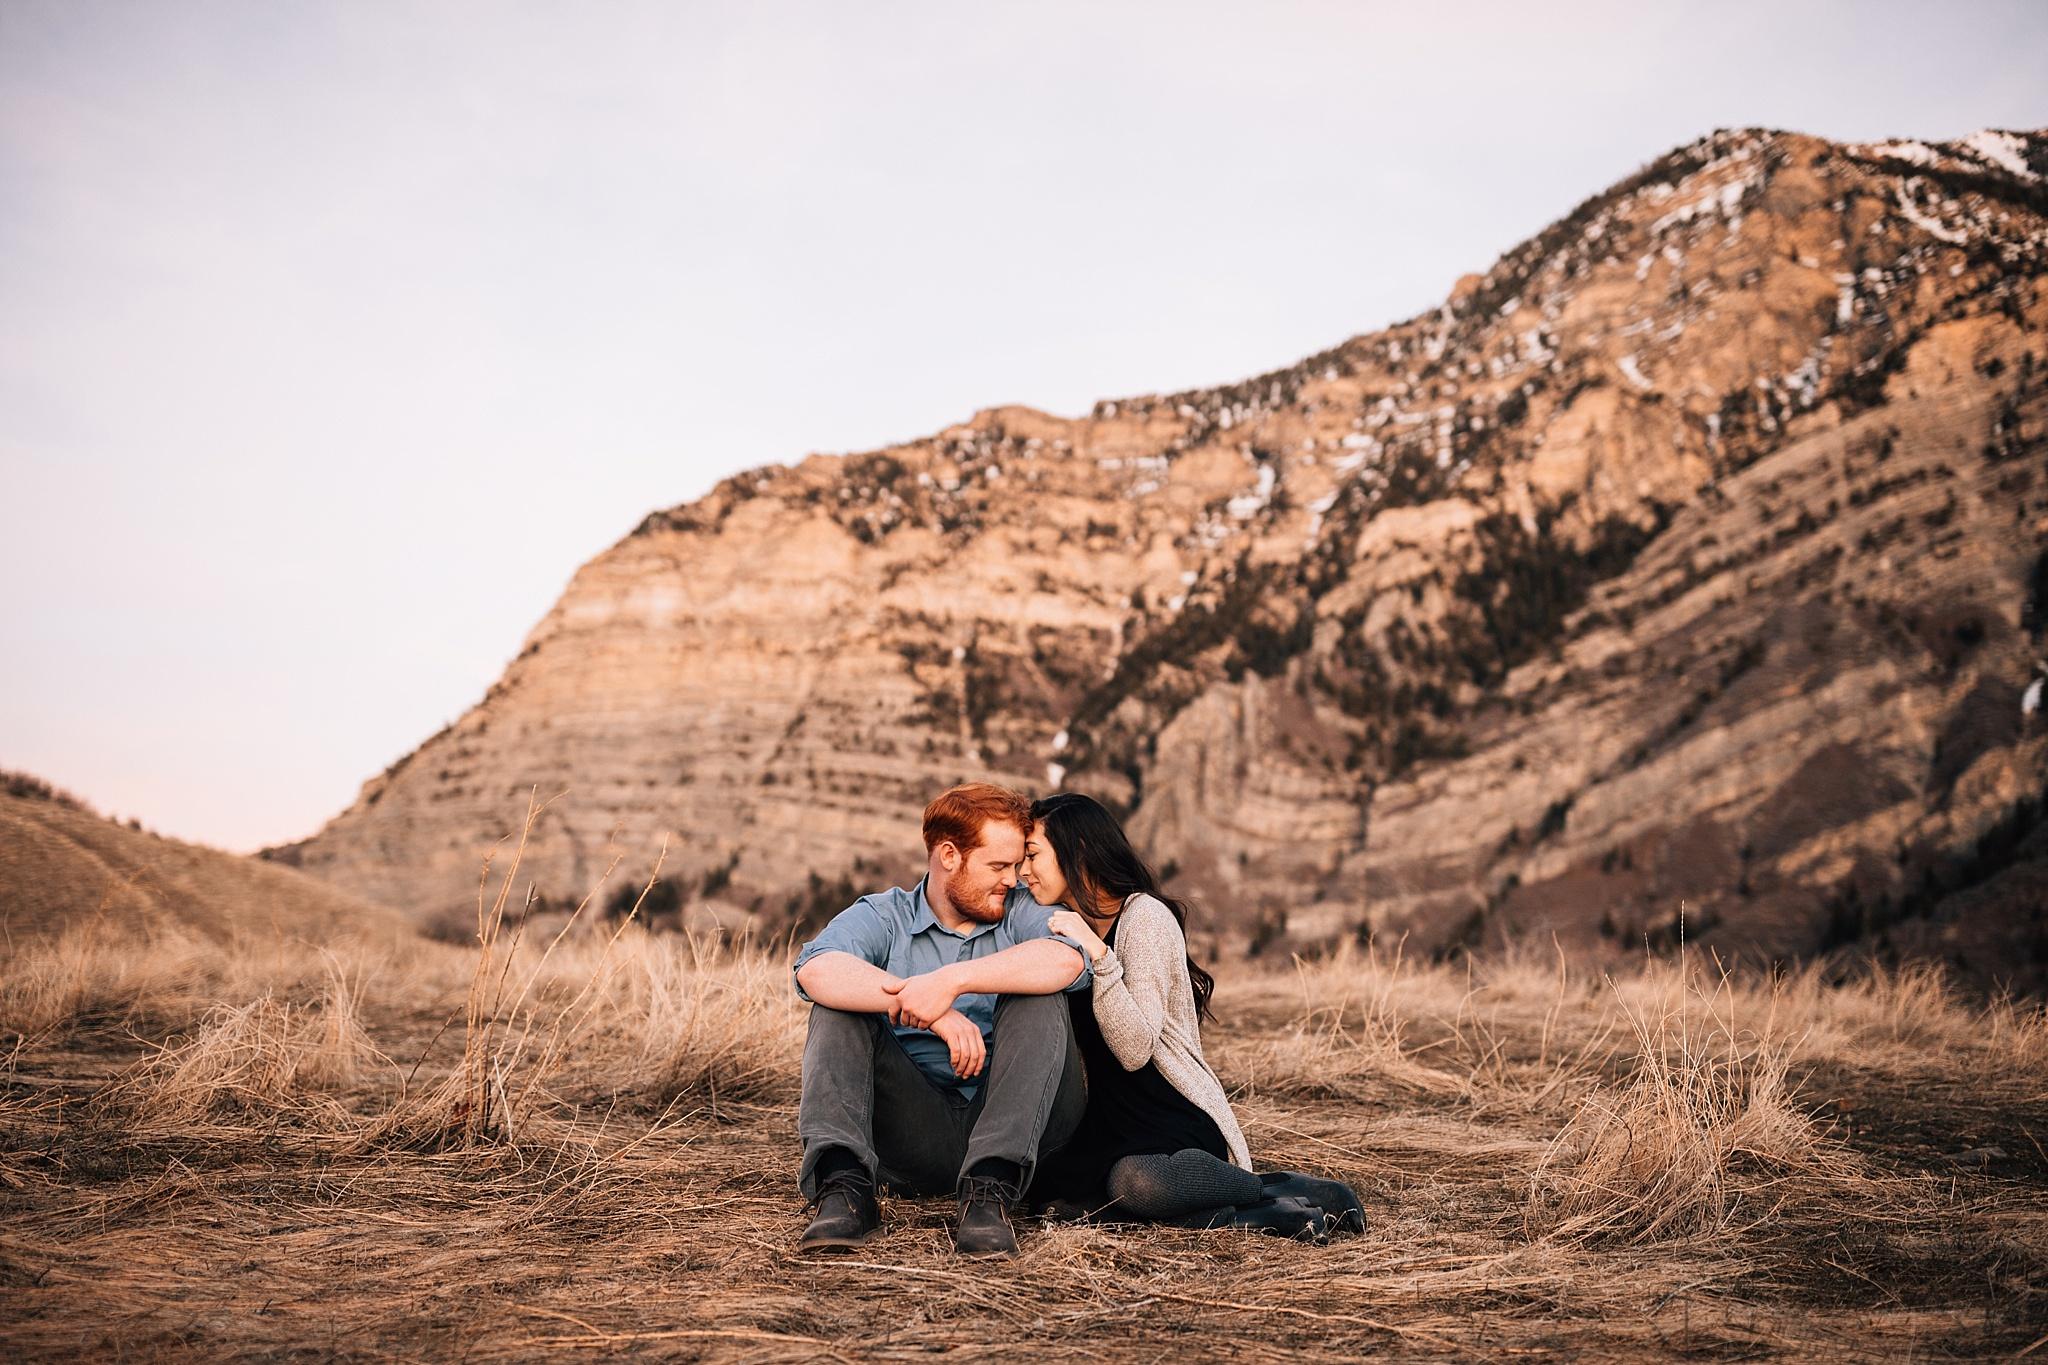 Adventurous bride,Bailey Dalton Photo,Intimate Wedding photographer,Traveling Photographer,Utah Engagement photographer,Utah Wedding Photographer,boho bride,